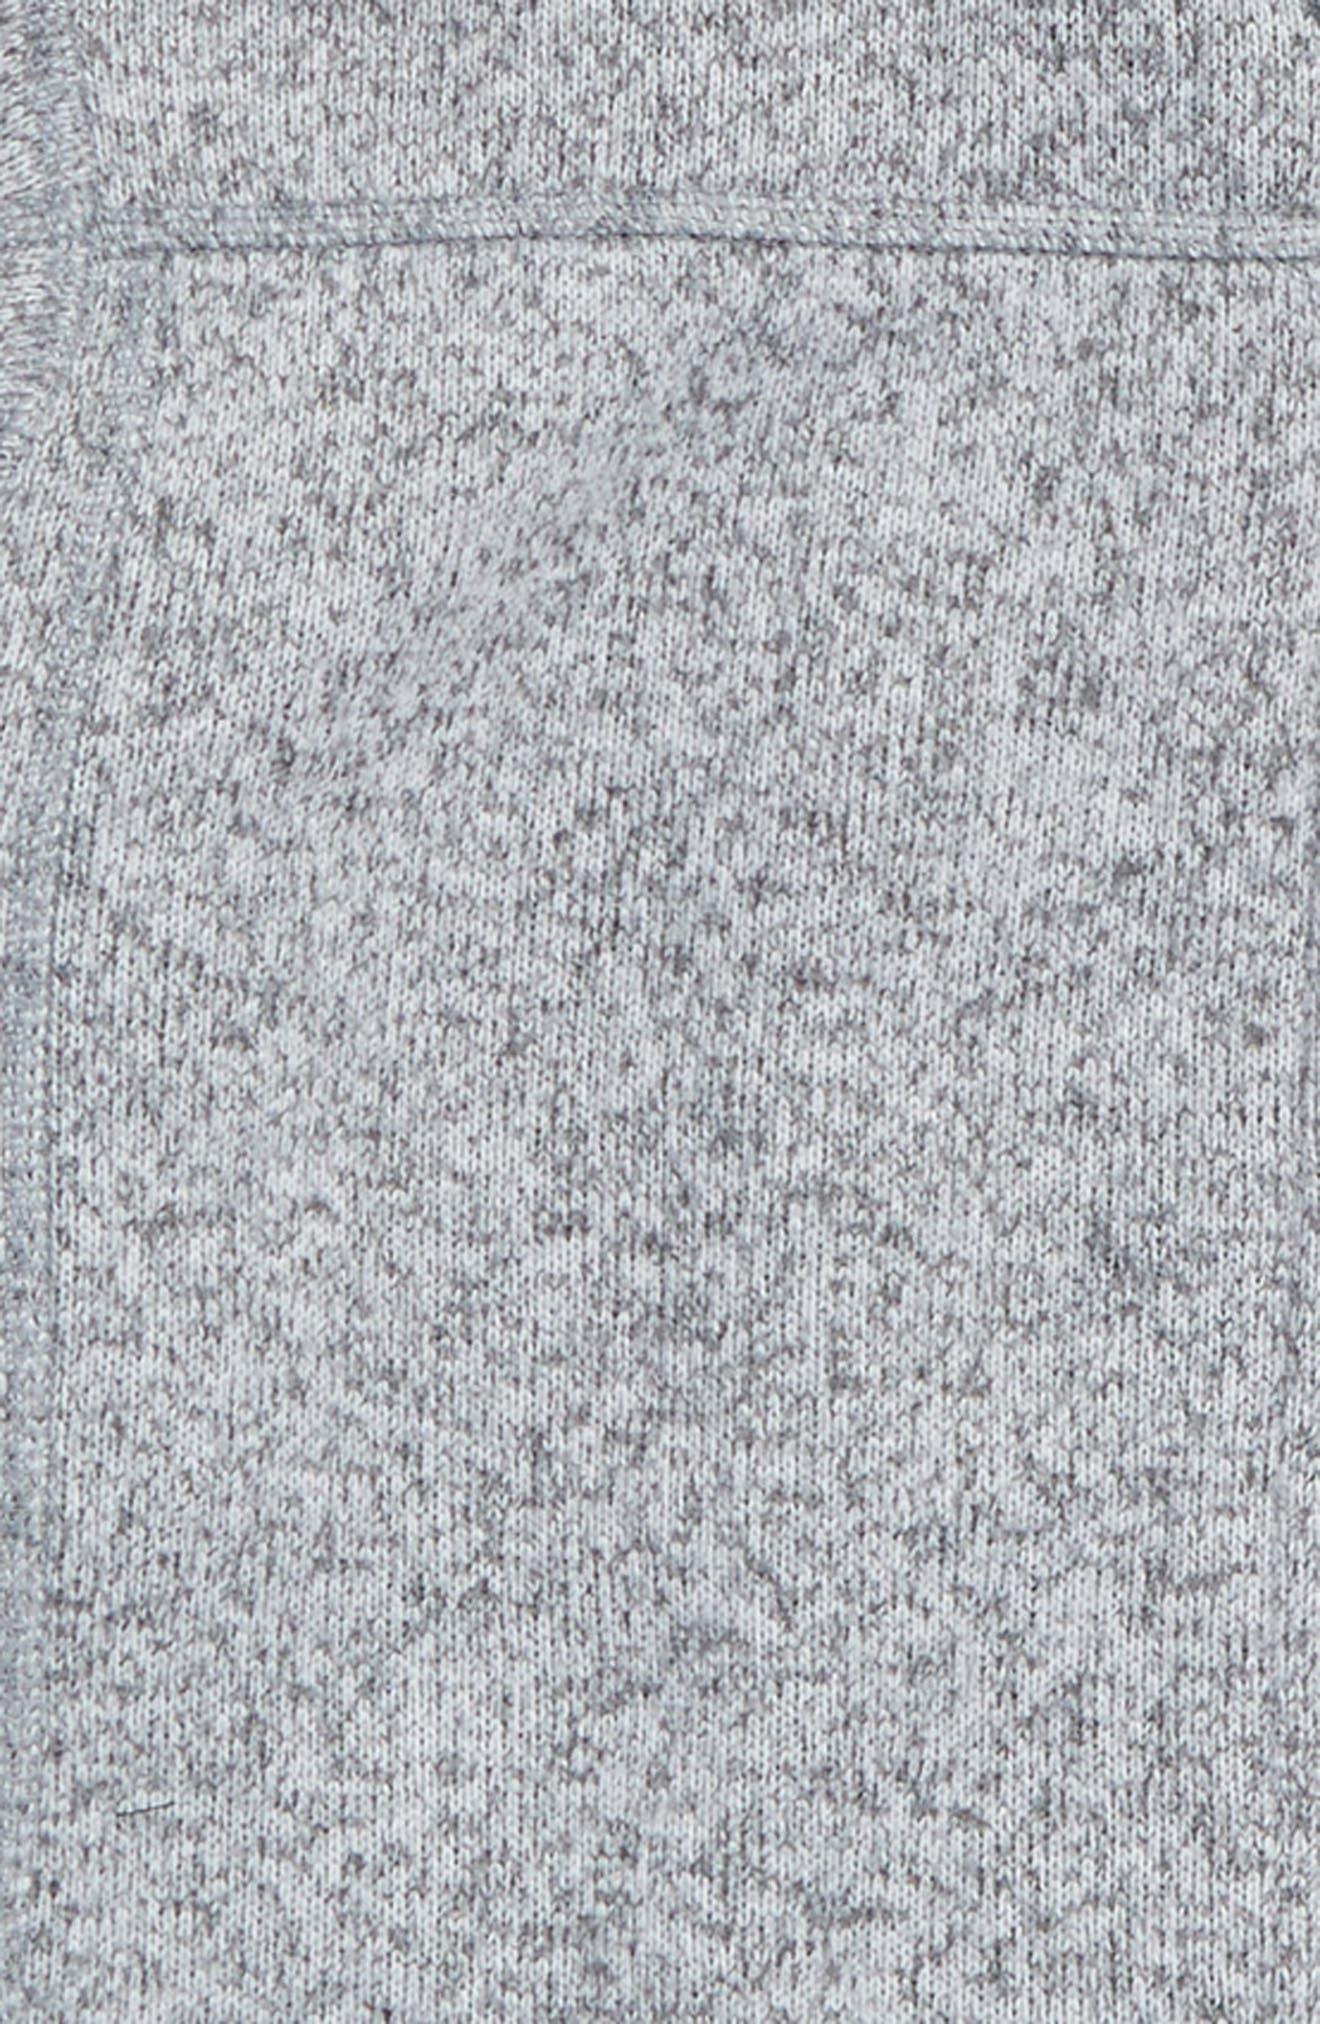 Alternate Image 2  - The North Face Gordon Lyons Sweater Fleece Zip Jacket (Big Boys)